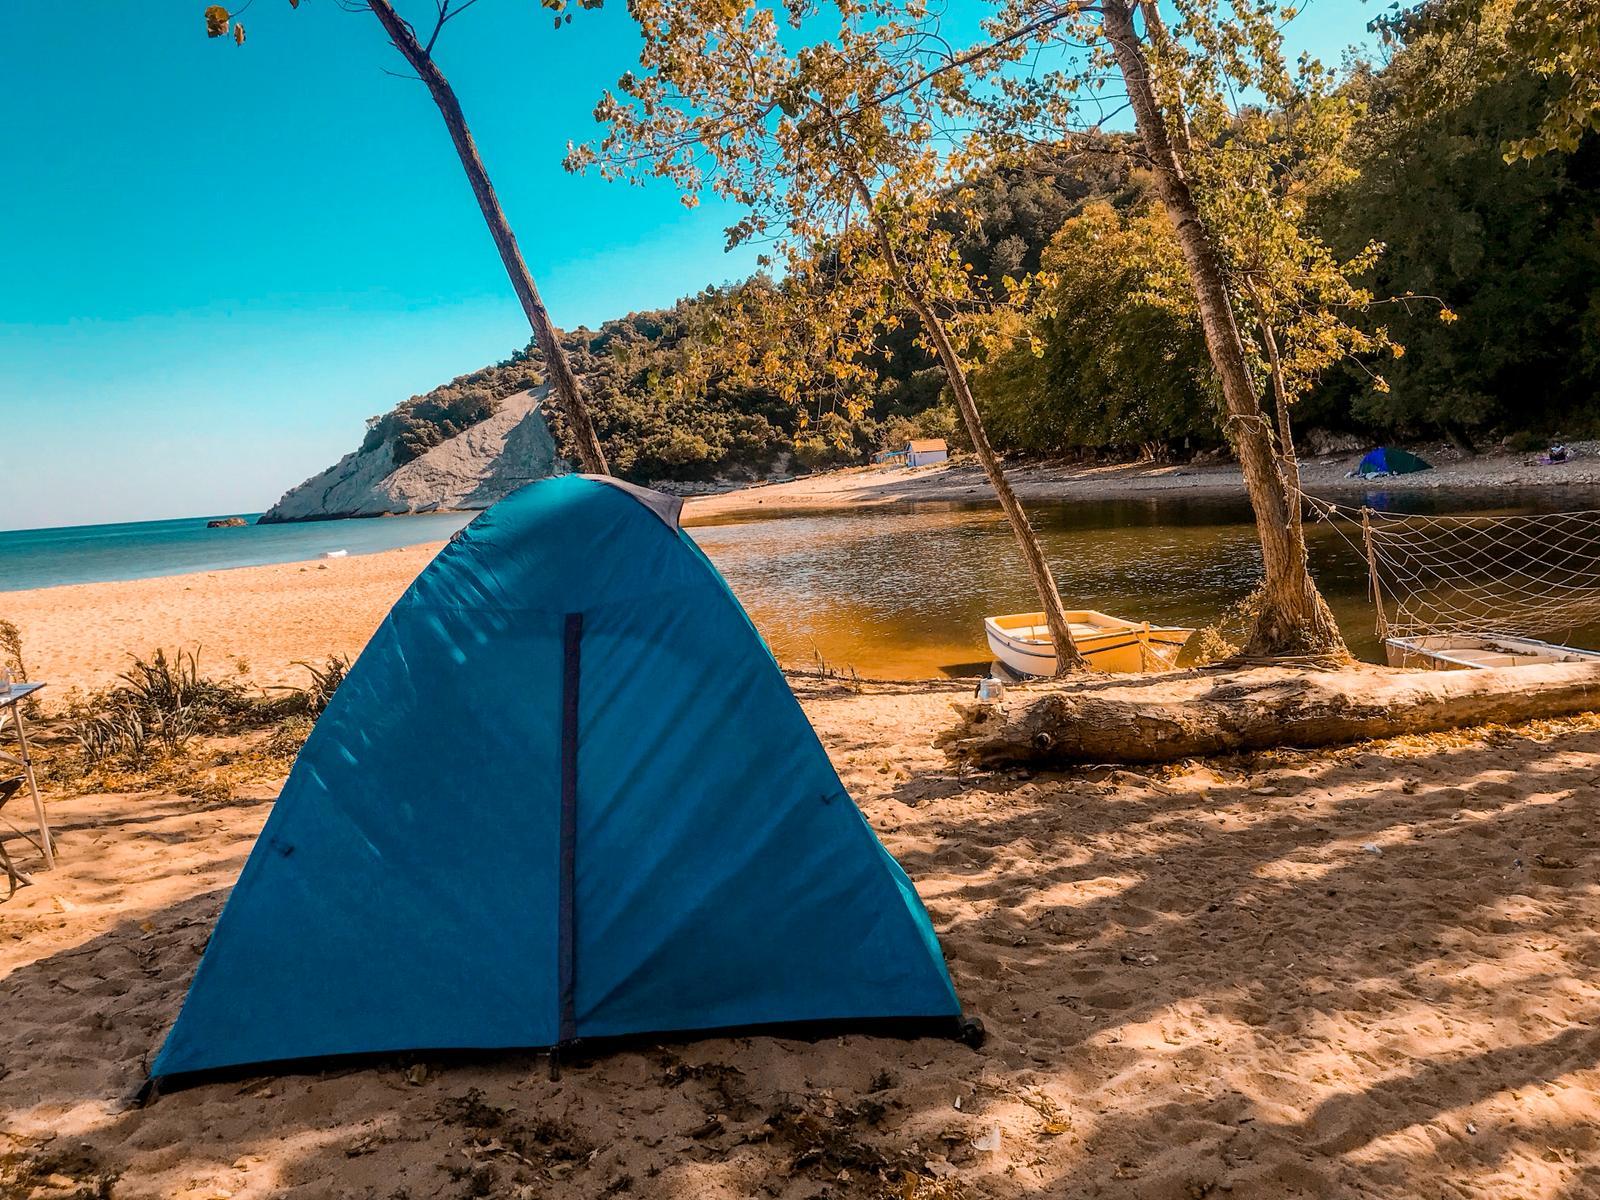 Kapısuyu Plajı Kamp Alanı